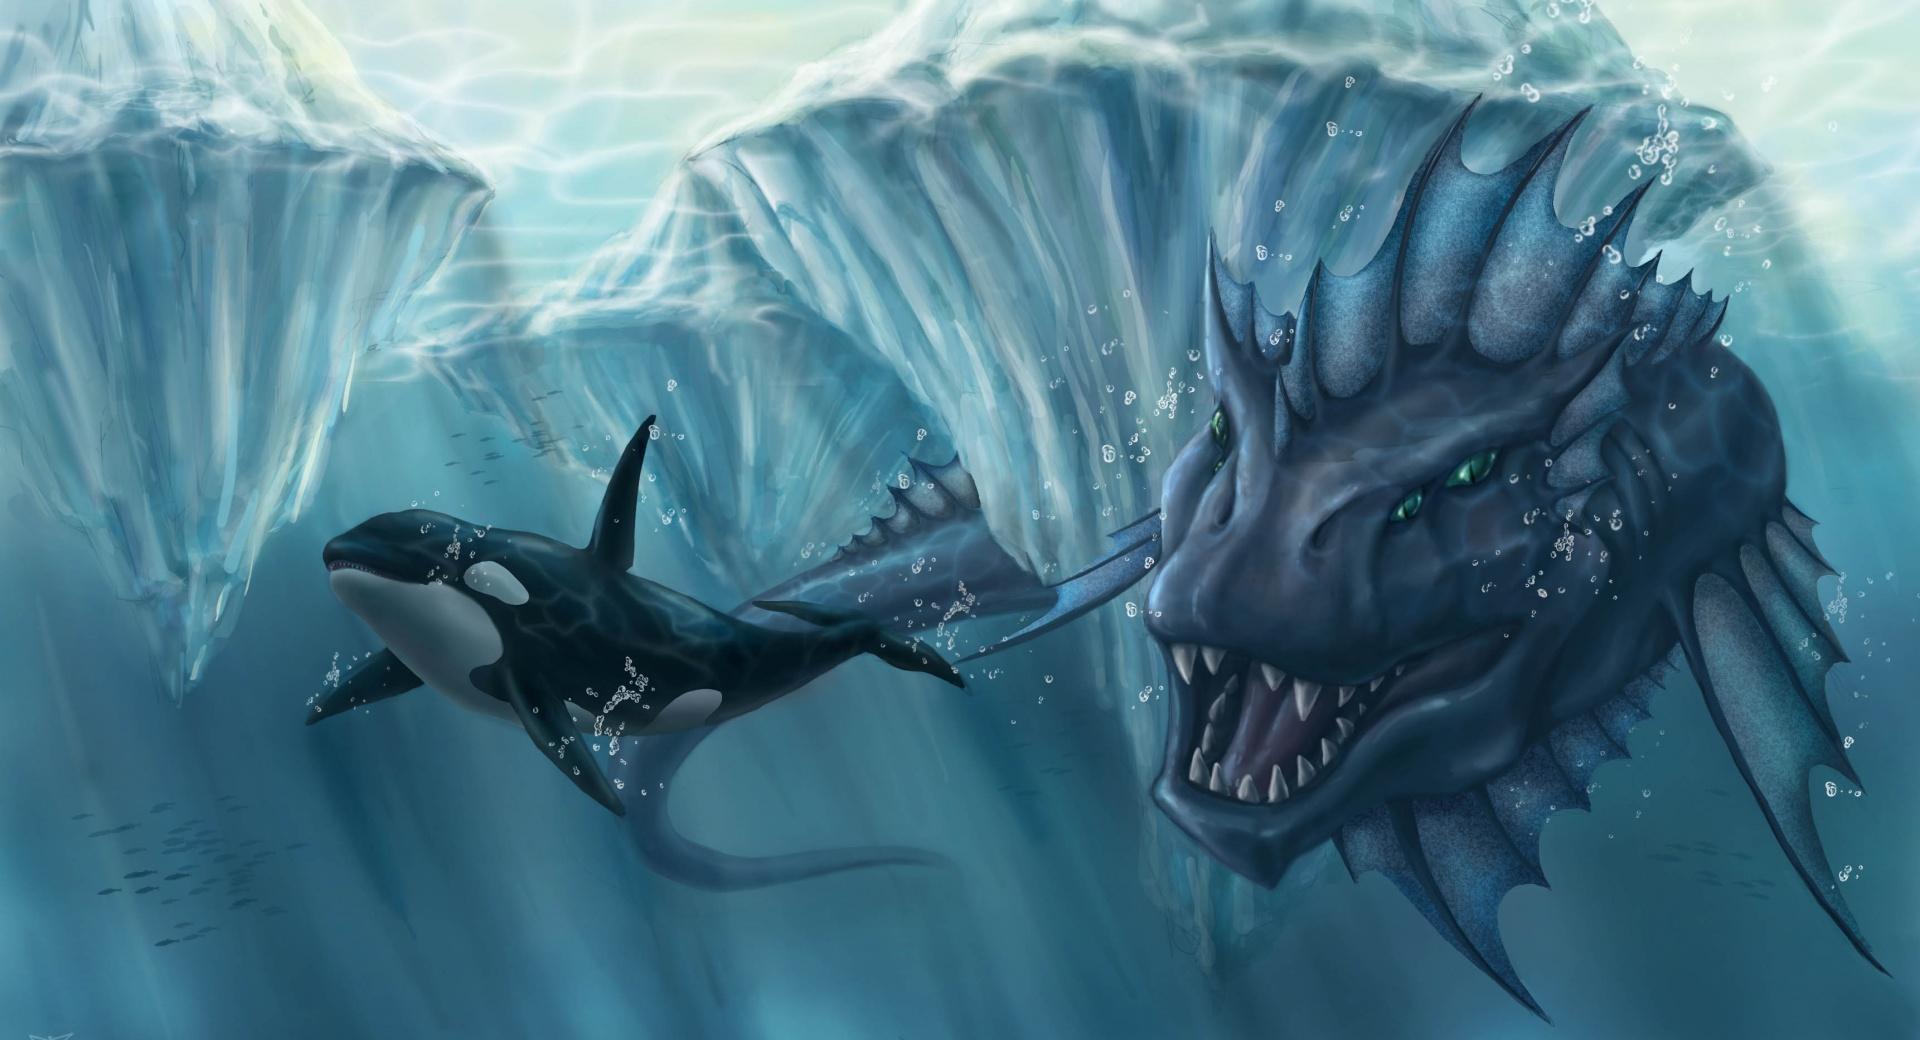 Prehistoric Underwater Monster wallpapers HD quality